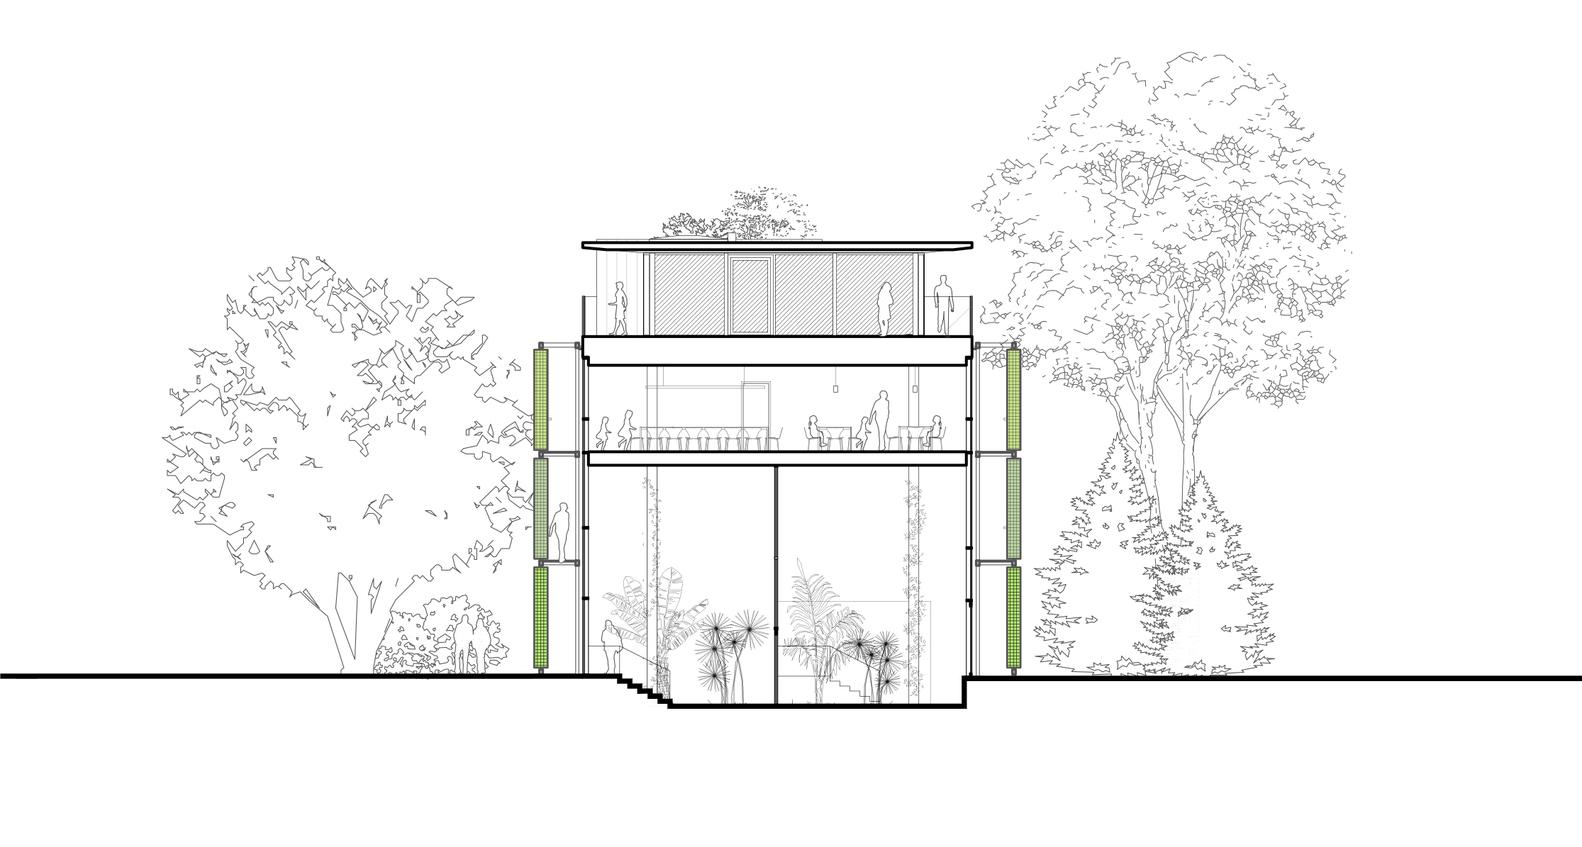 VU Botanical Garden Laboratory,Section